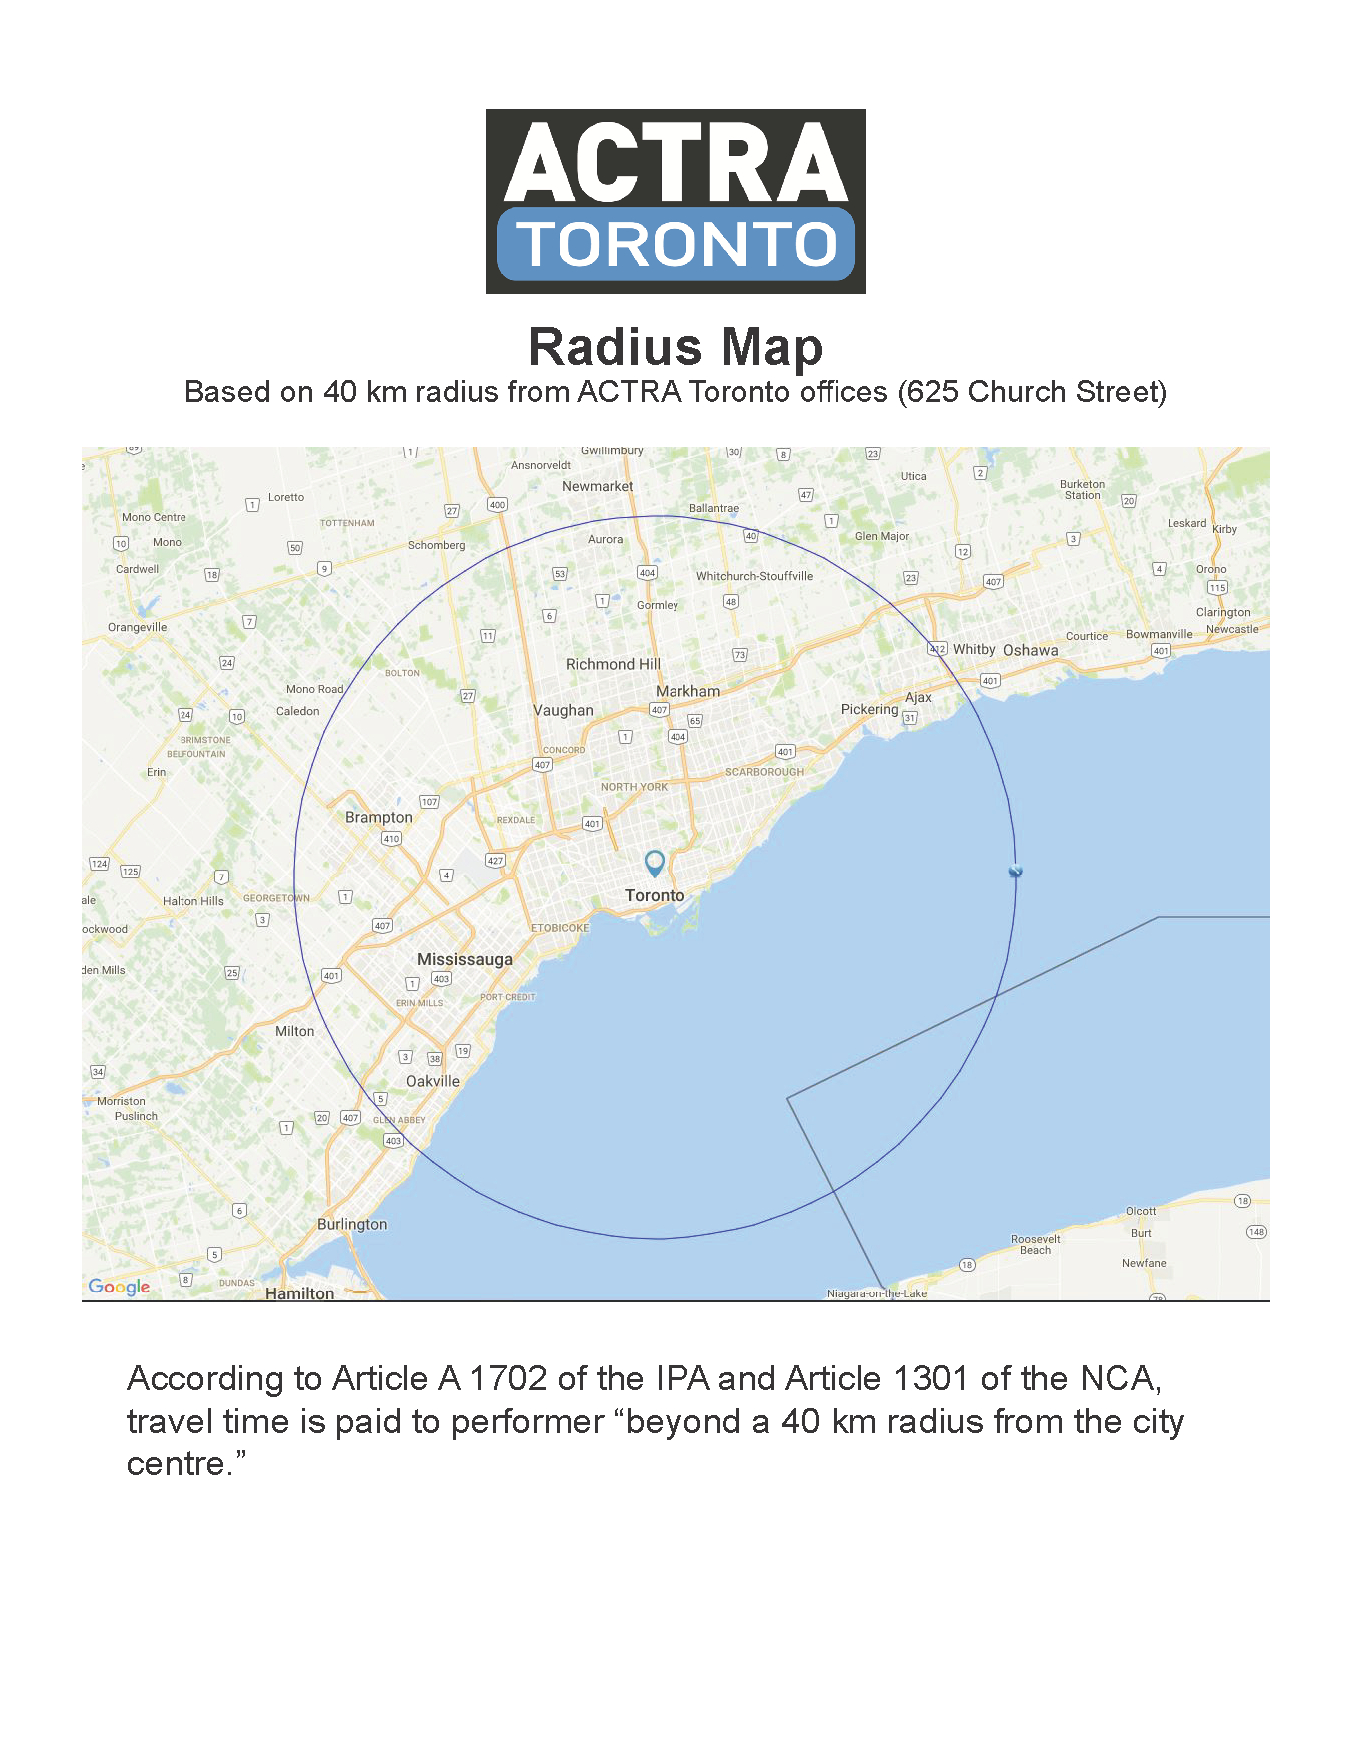 Actra Toronto Radius Map | Actra Toronto - Printable Radius Map